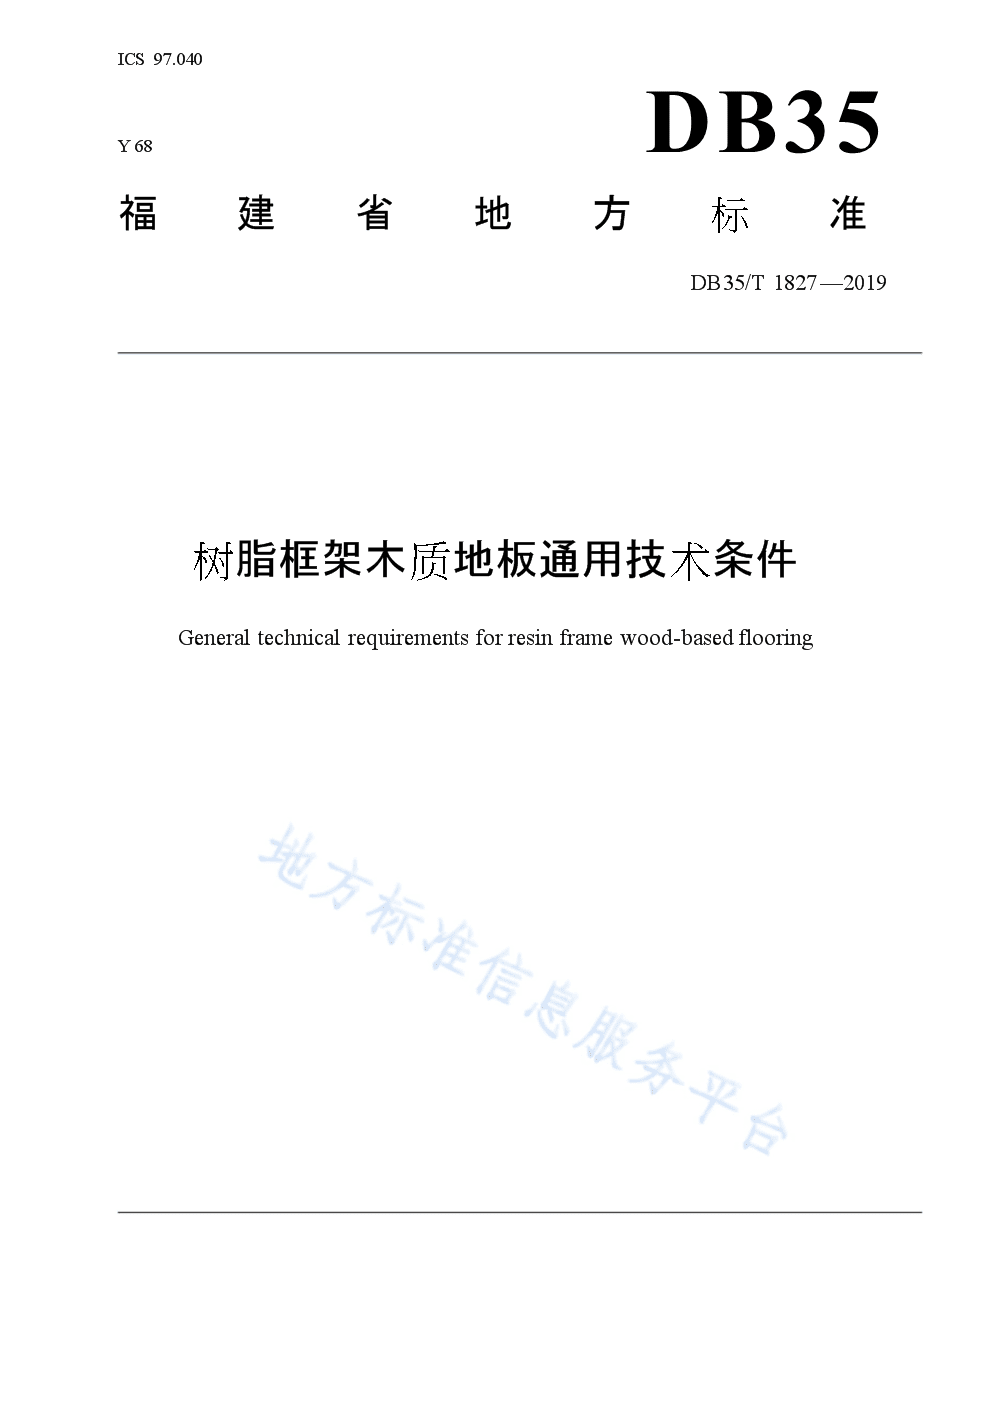 DB35_T 1827-2019树脂框架木质地板通用技术条件.docx